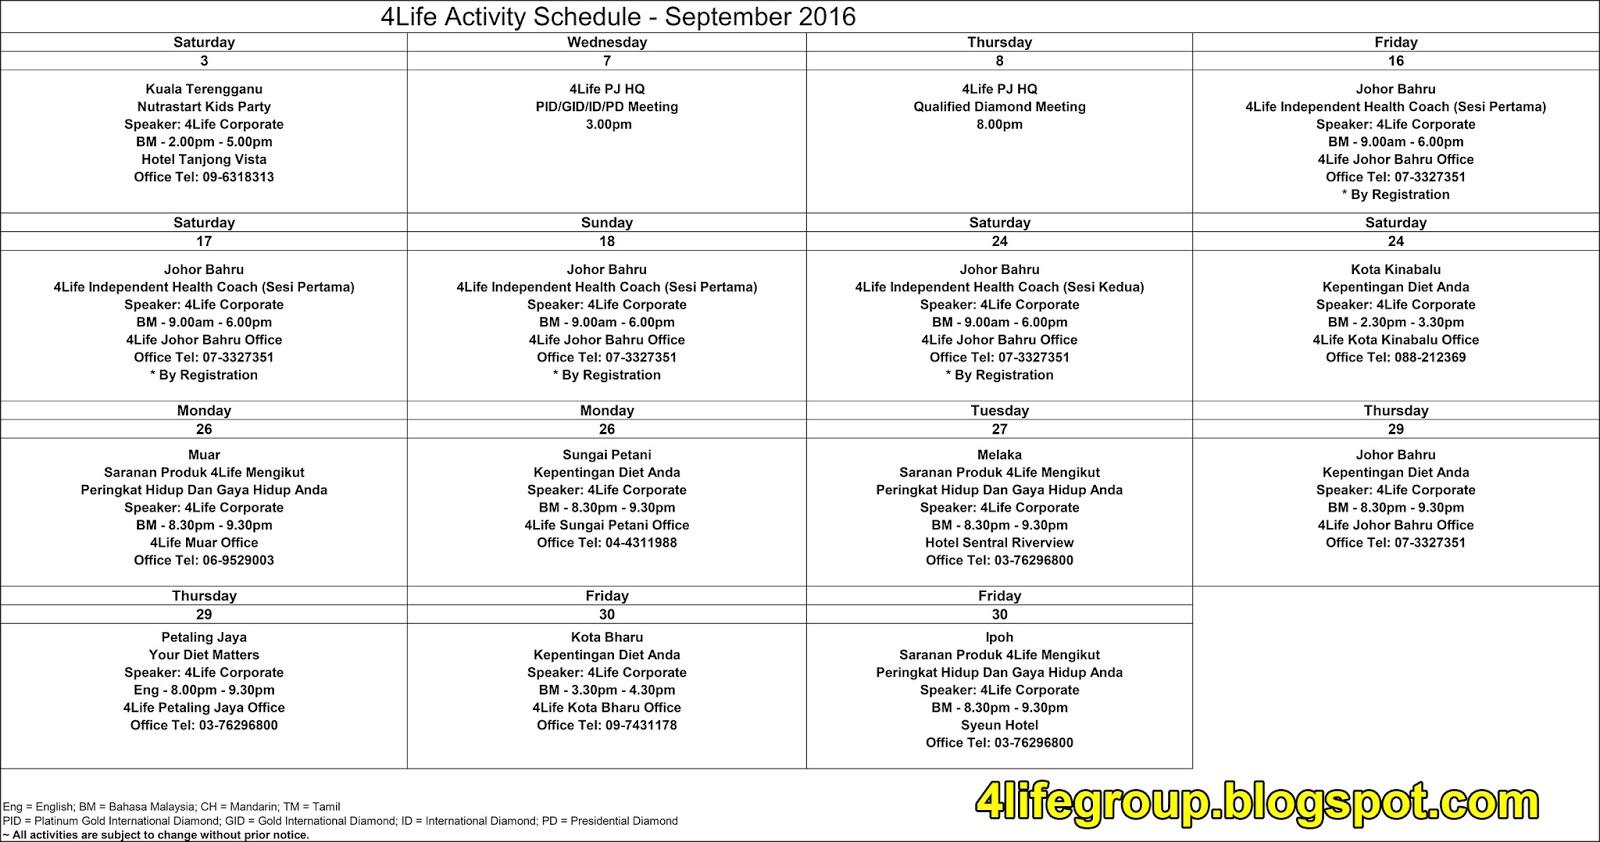 foto Jadual Aktiviti Bulanan September 2016 4Life Malaysia